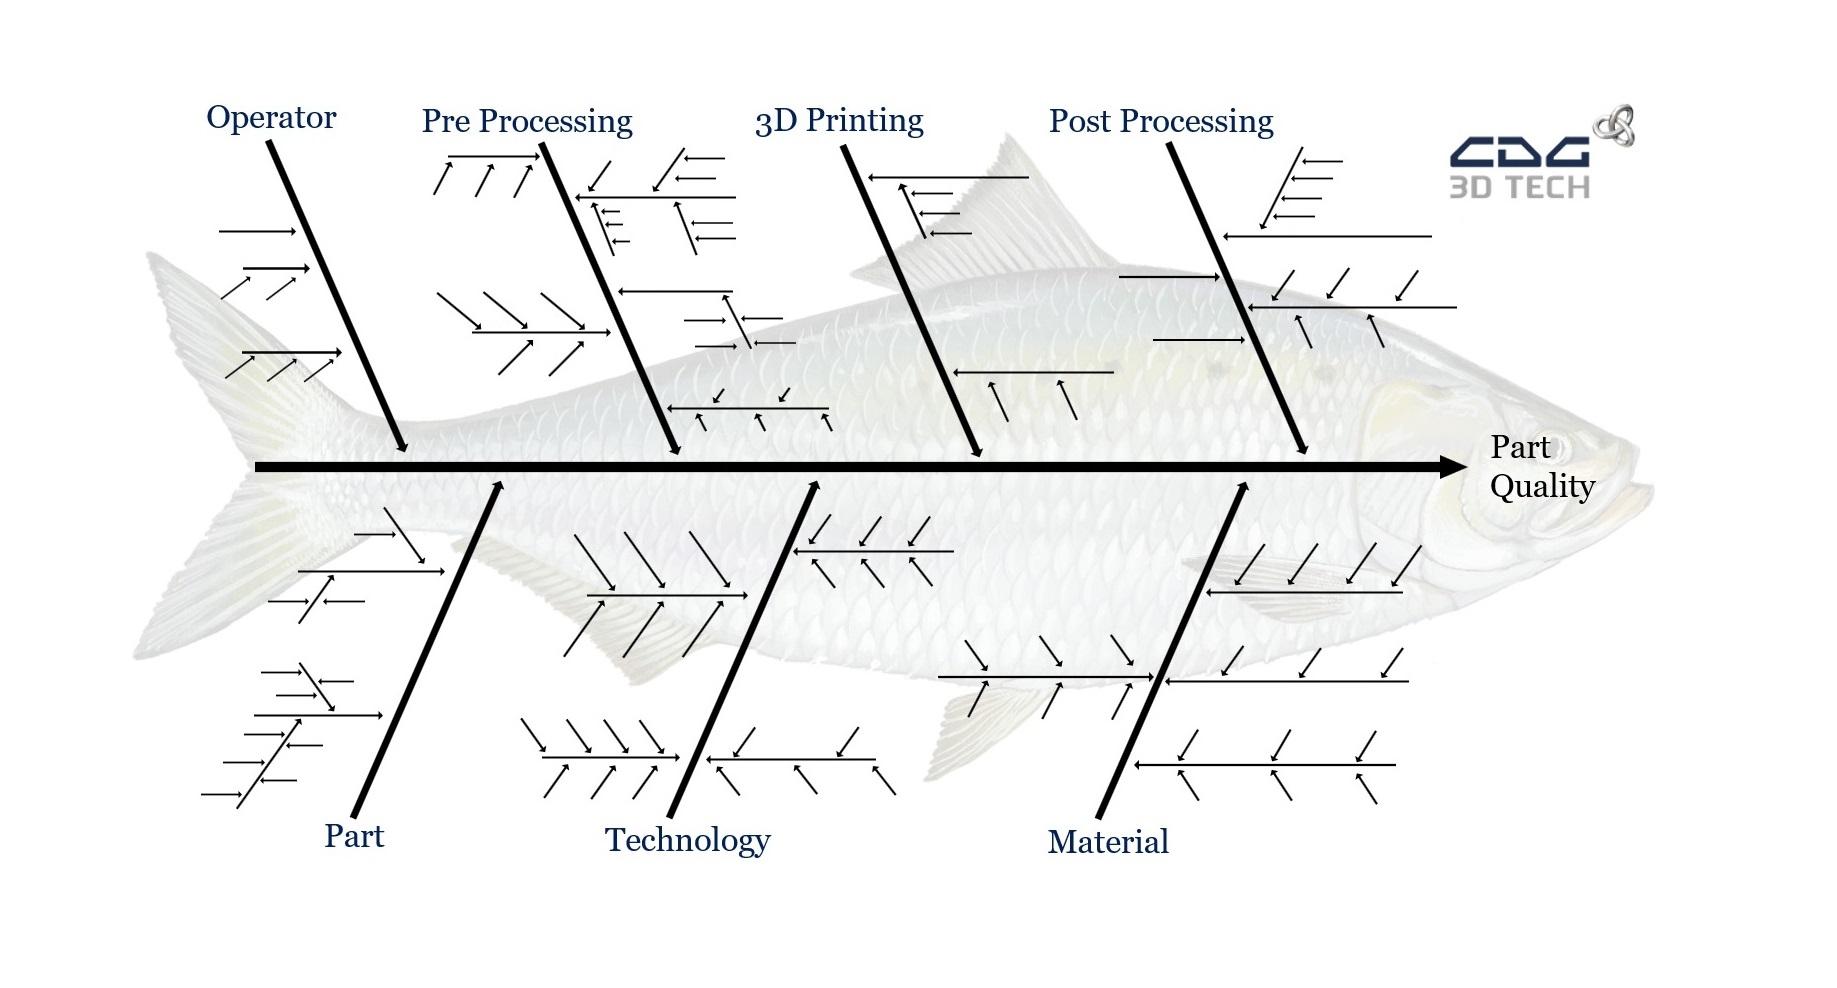 Ishikawa Fishbone Diagram 3D Printing Technology bones only sample